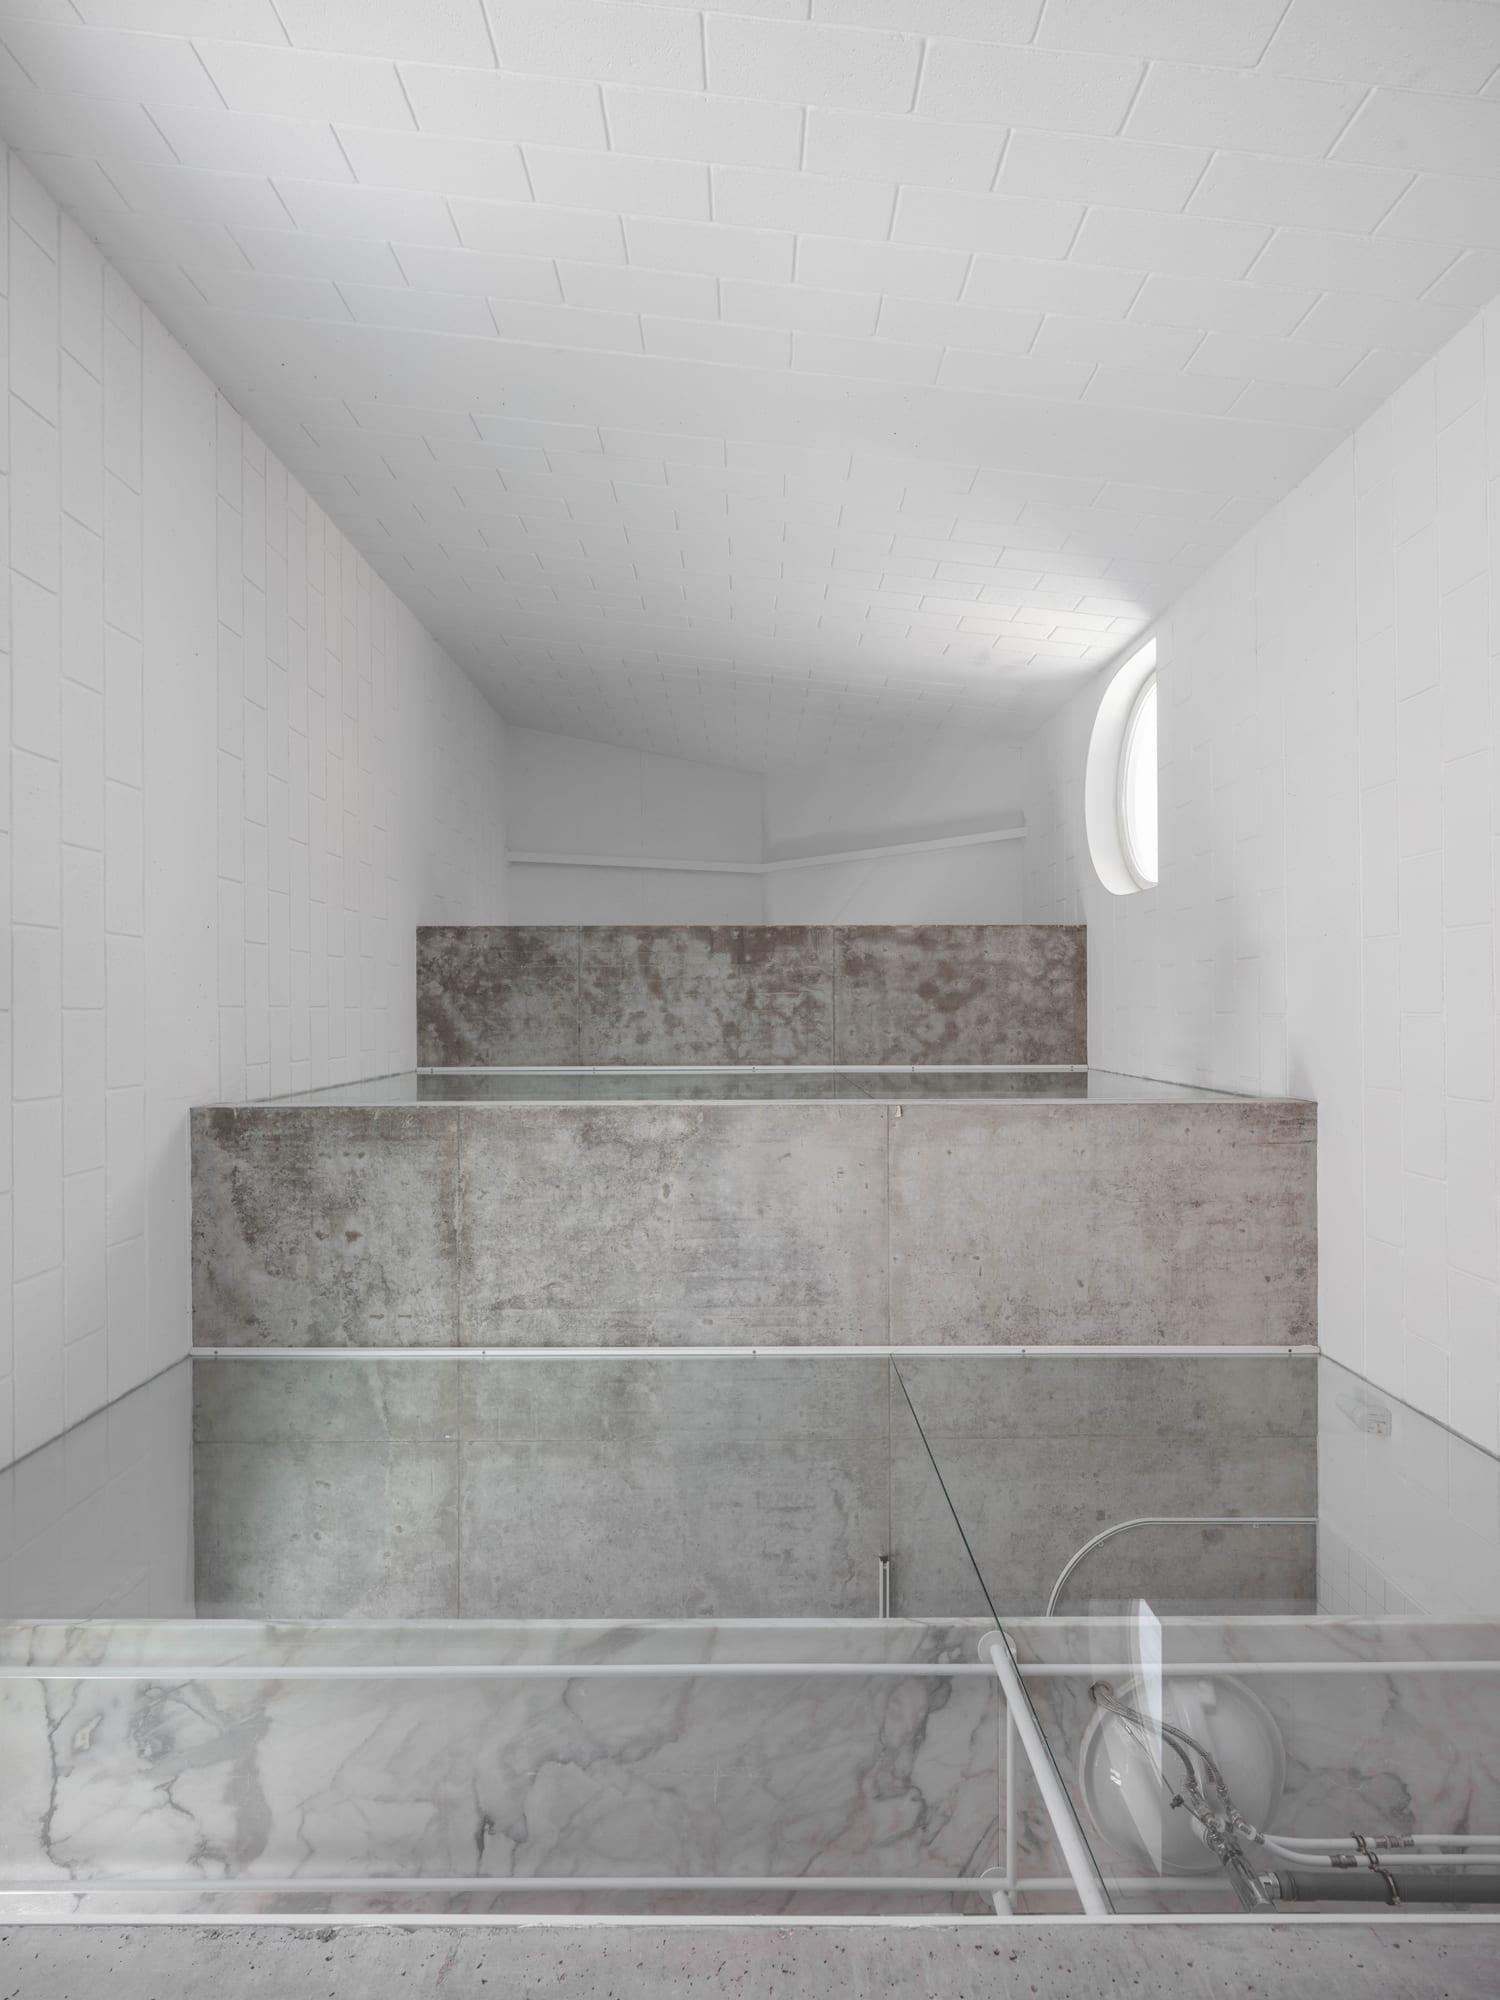 Dodged House In Lisbon By Leopold Banchini Daniel Zamarbide Yellowtrace 12